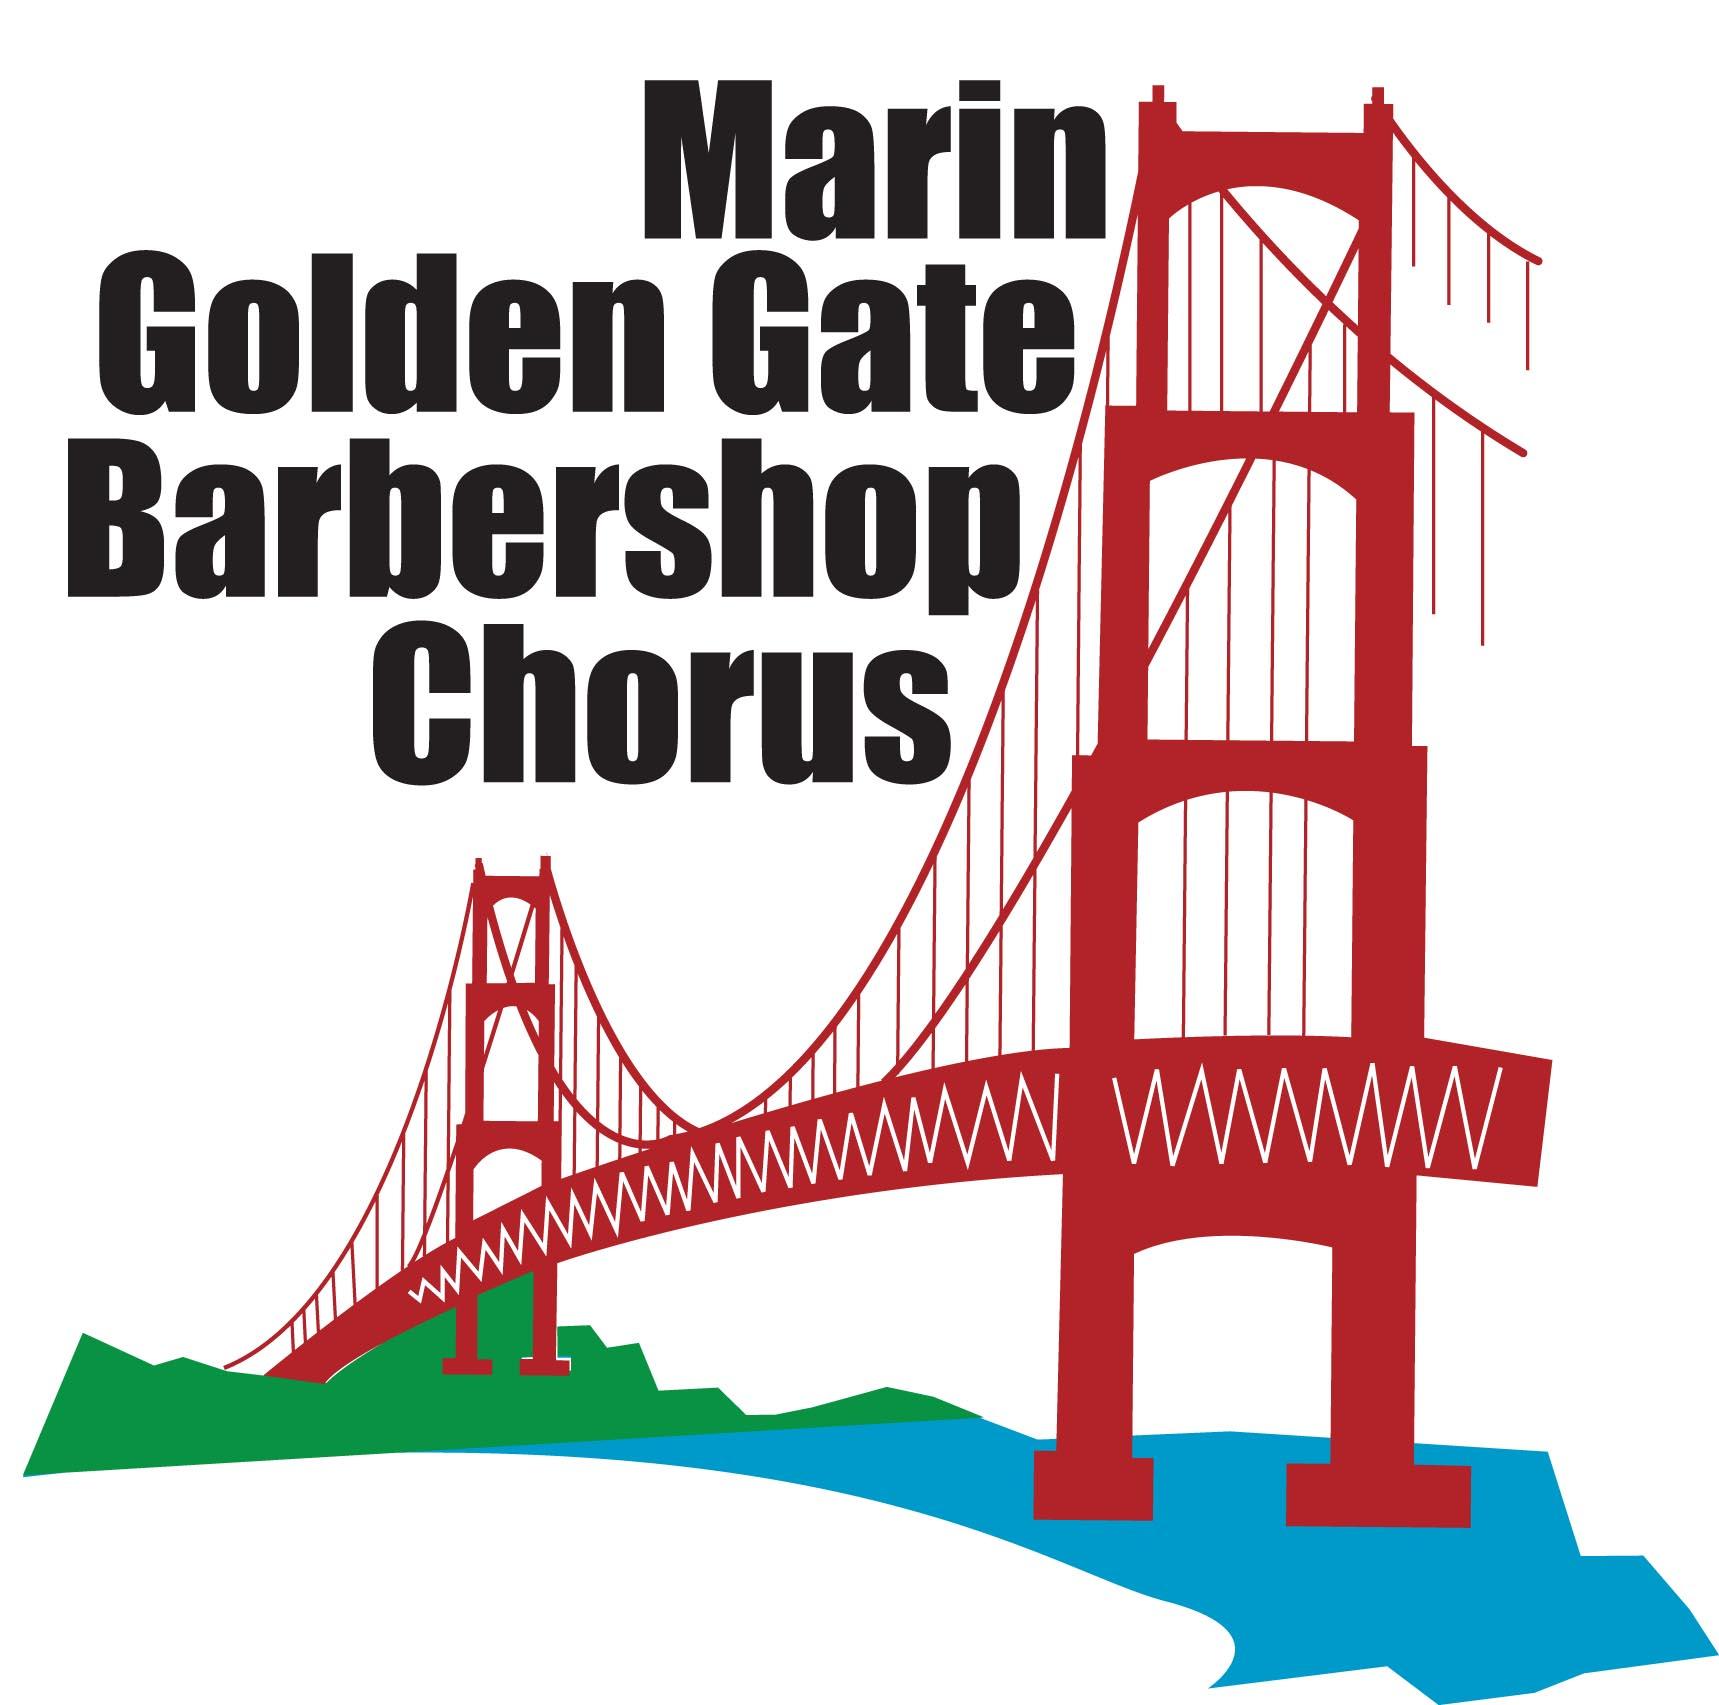 Barbershop Chorus